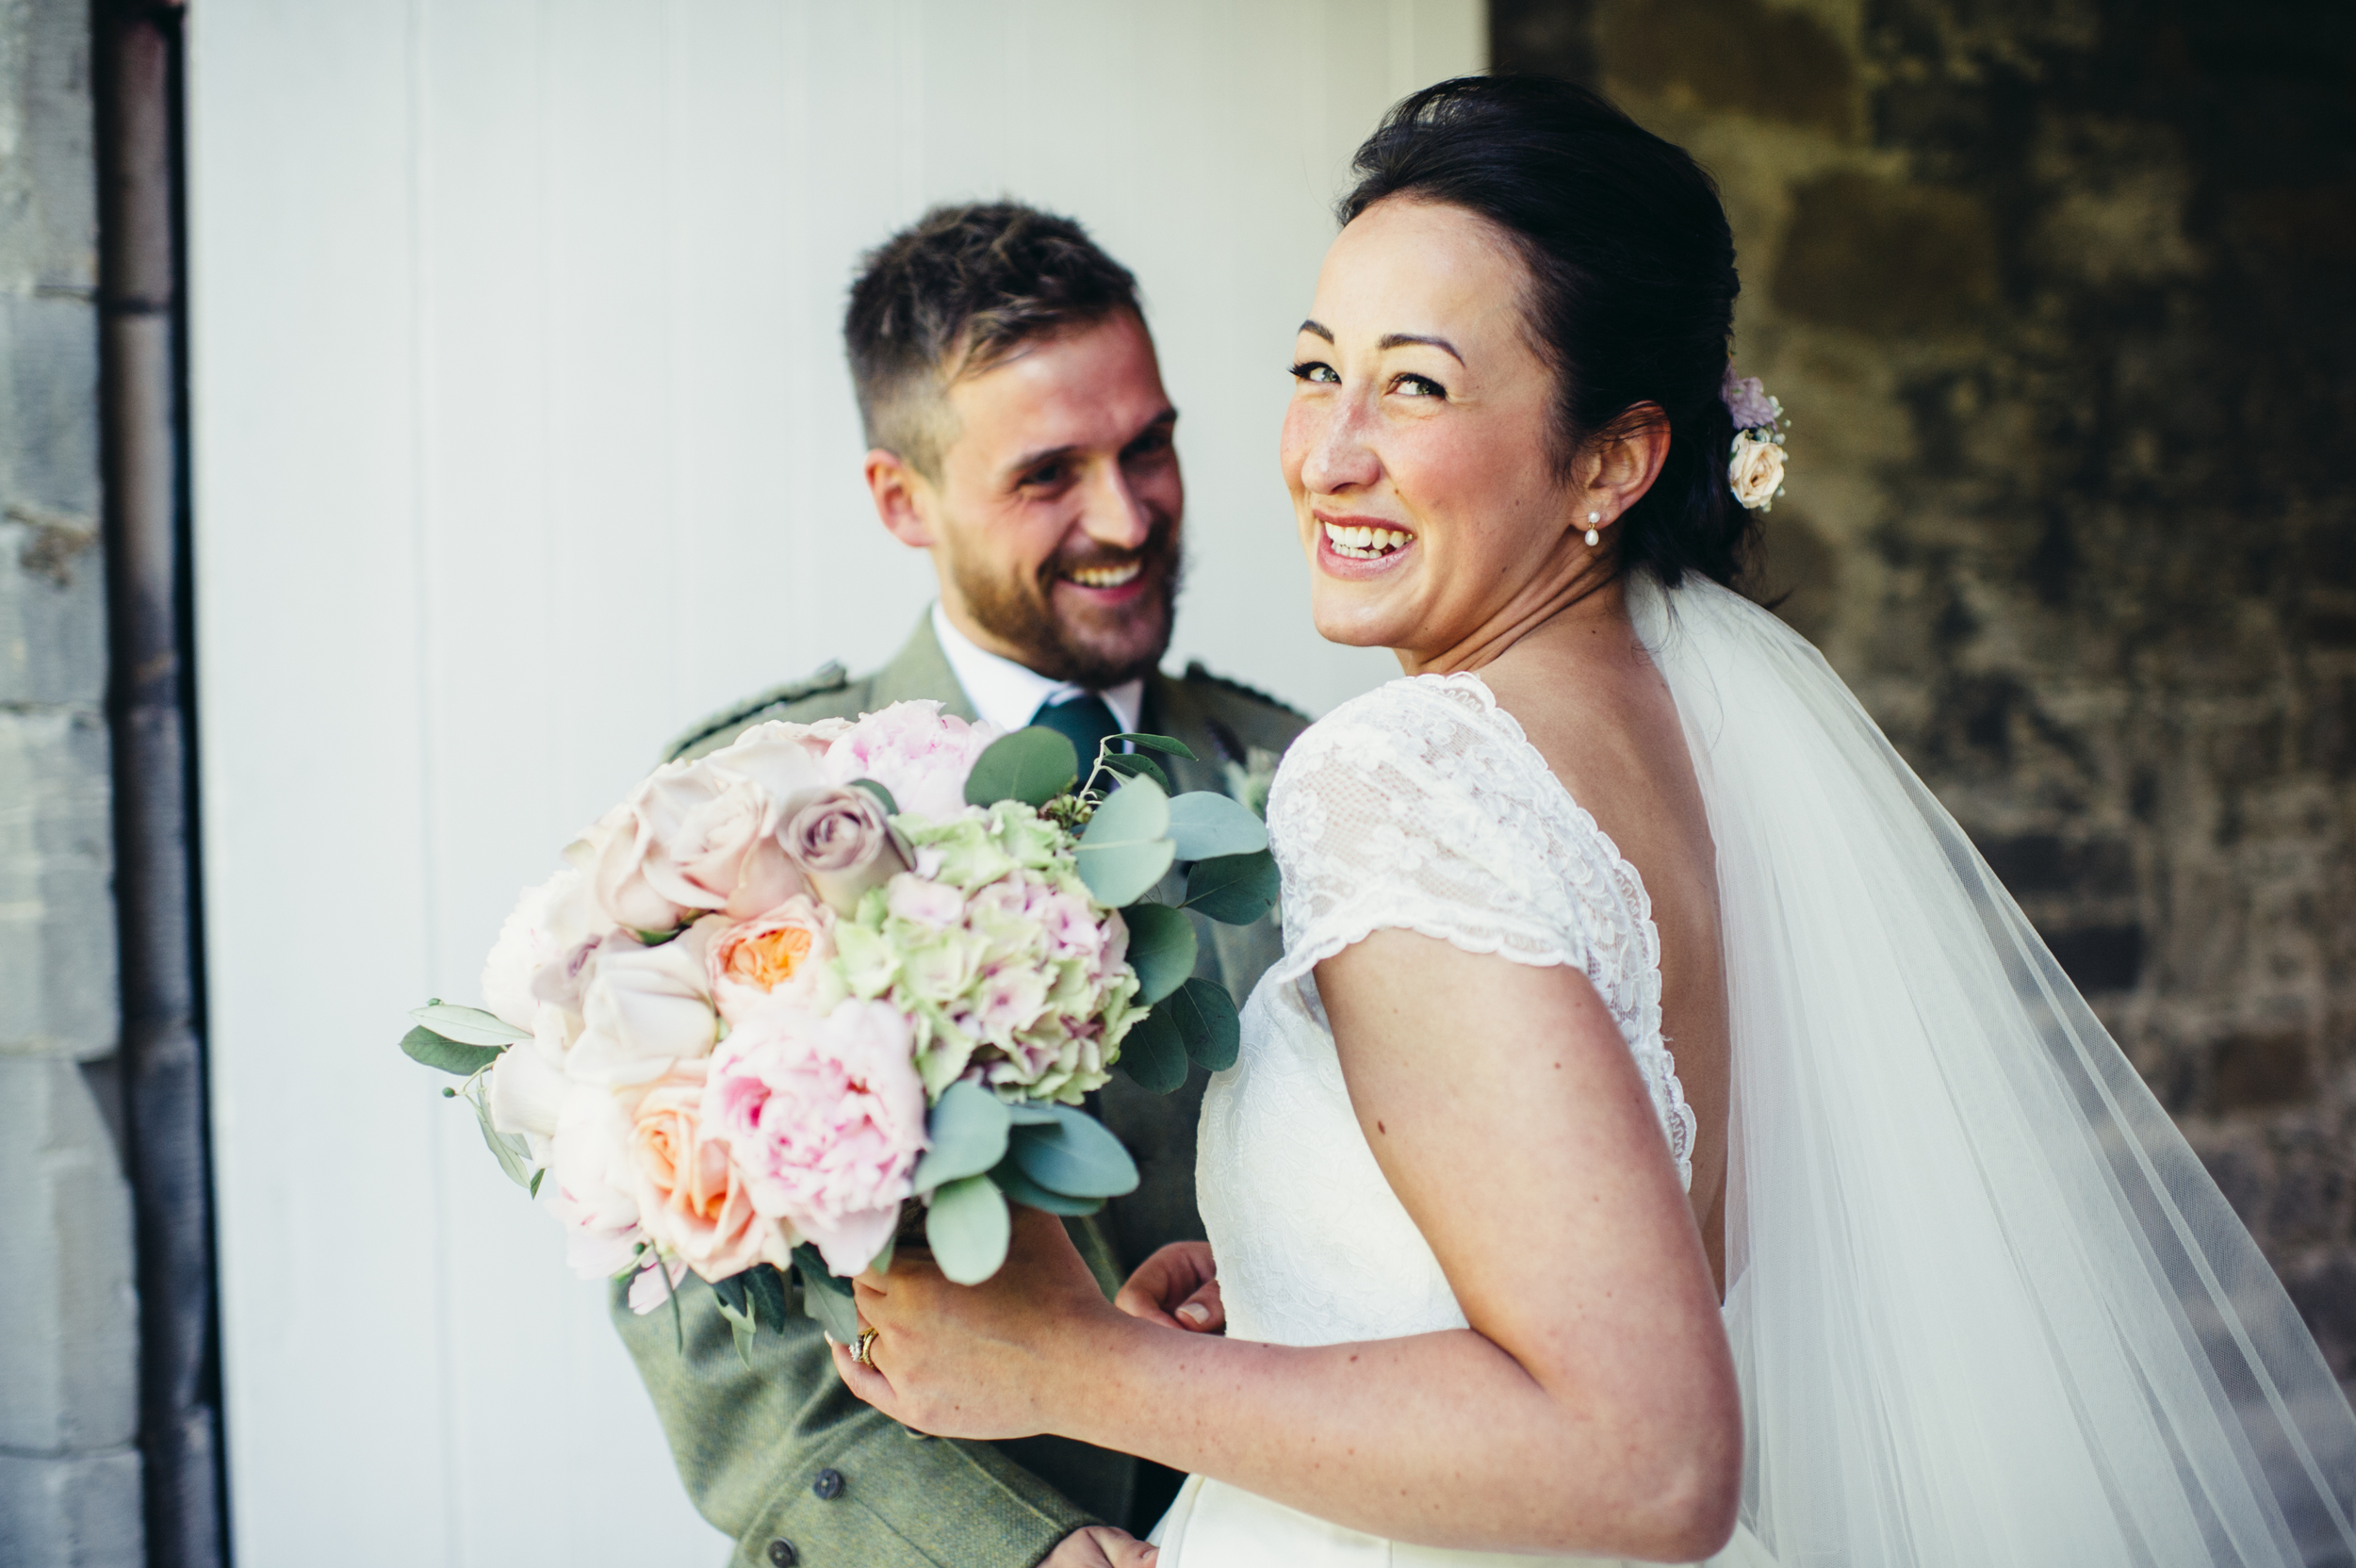 0117-lisa-devine-alternative-creative-wedding-photography-glasgow-edinburgh.JPG